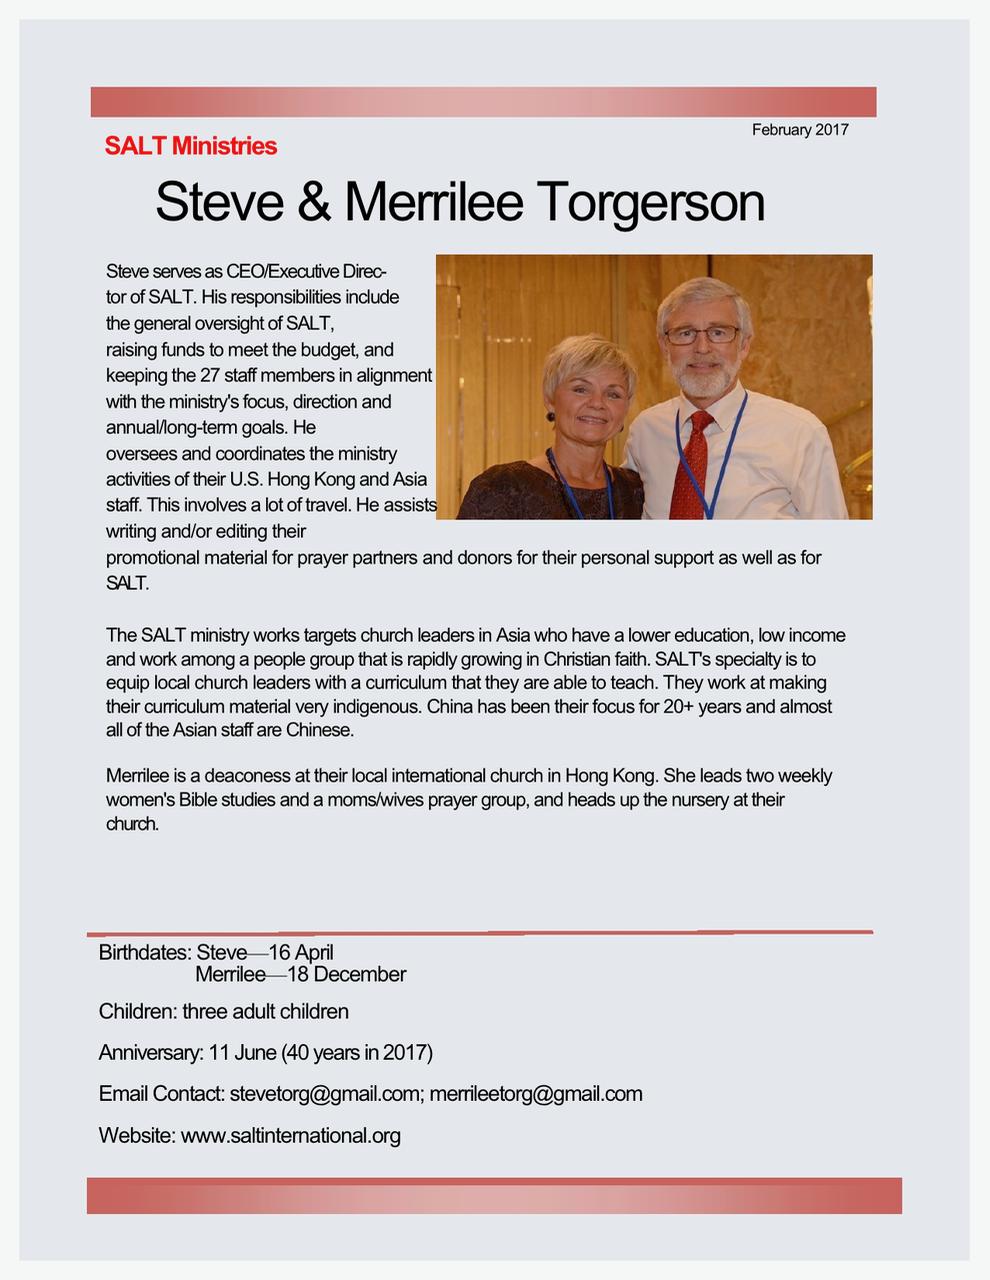 Steve and Merrilee Torgensen